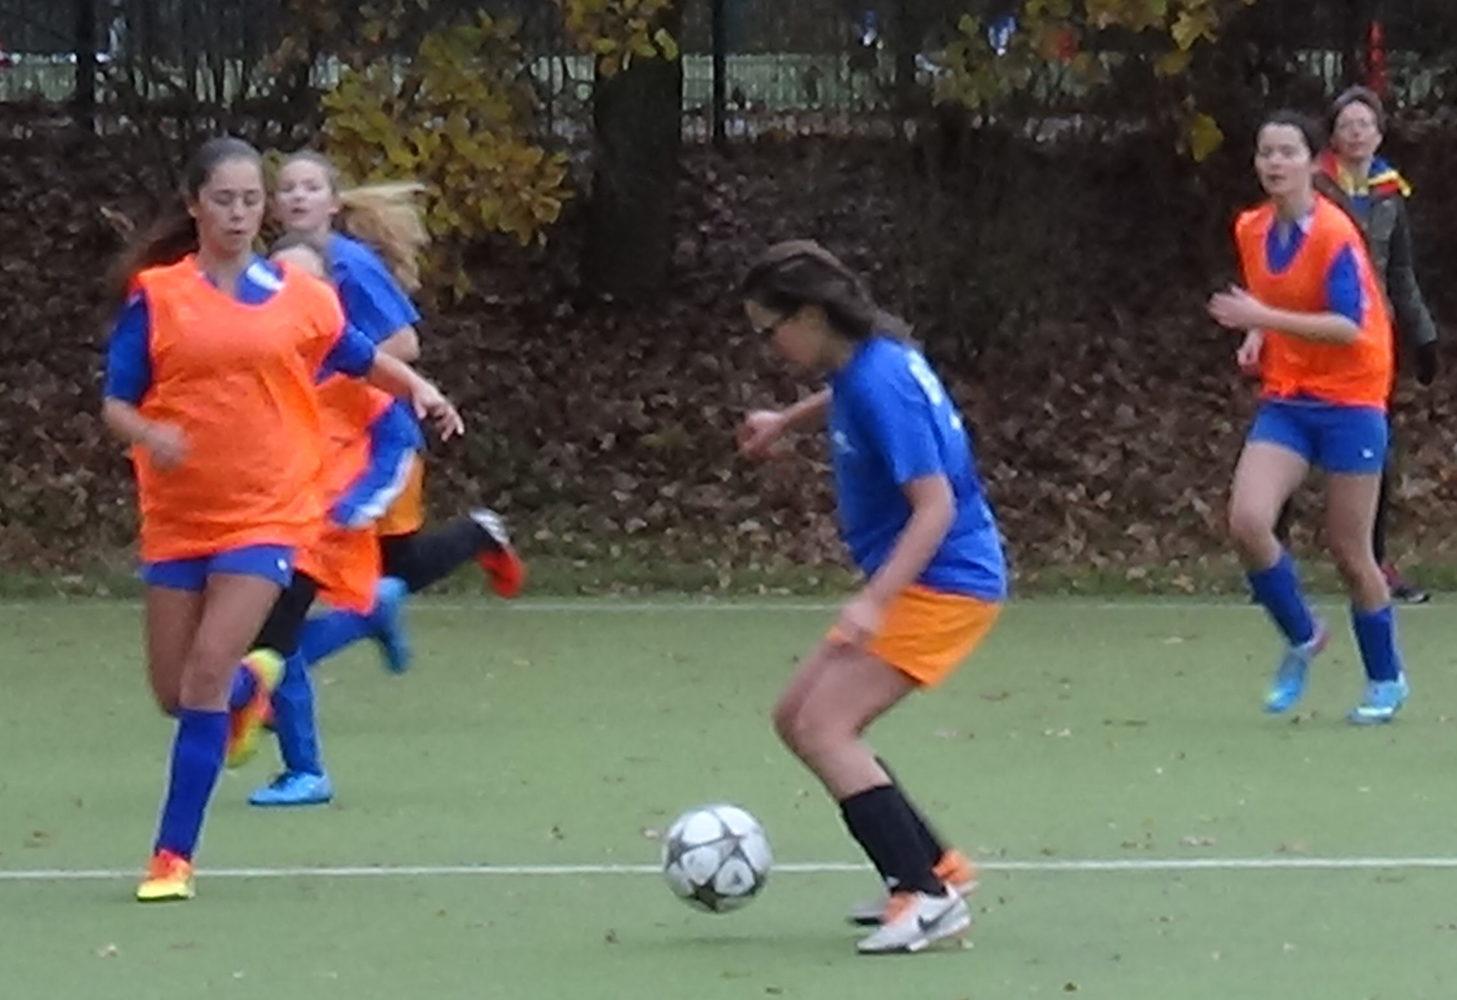 Soccer_Fußball_girls_berlin cosmopolitan school